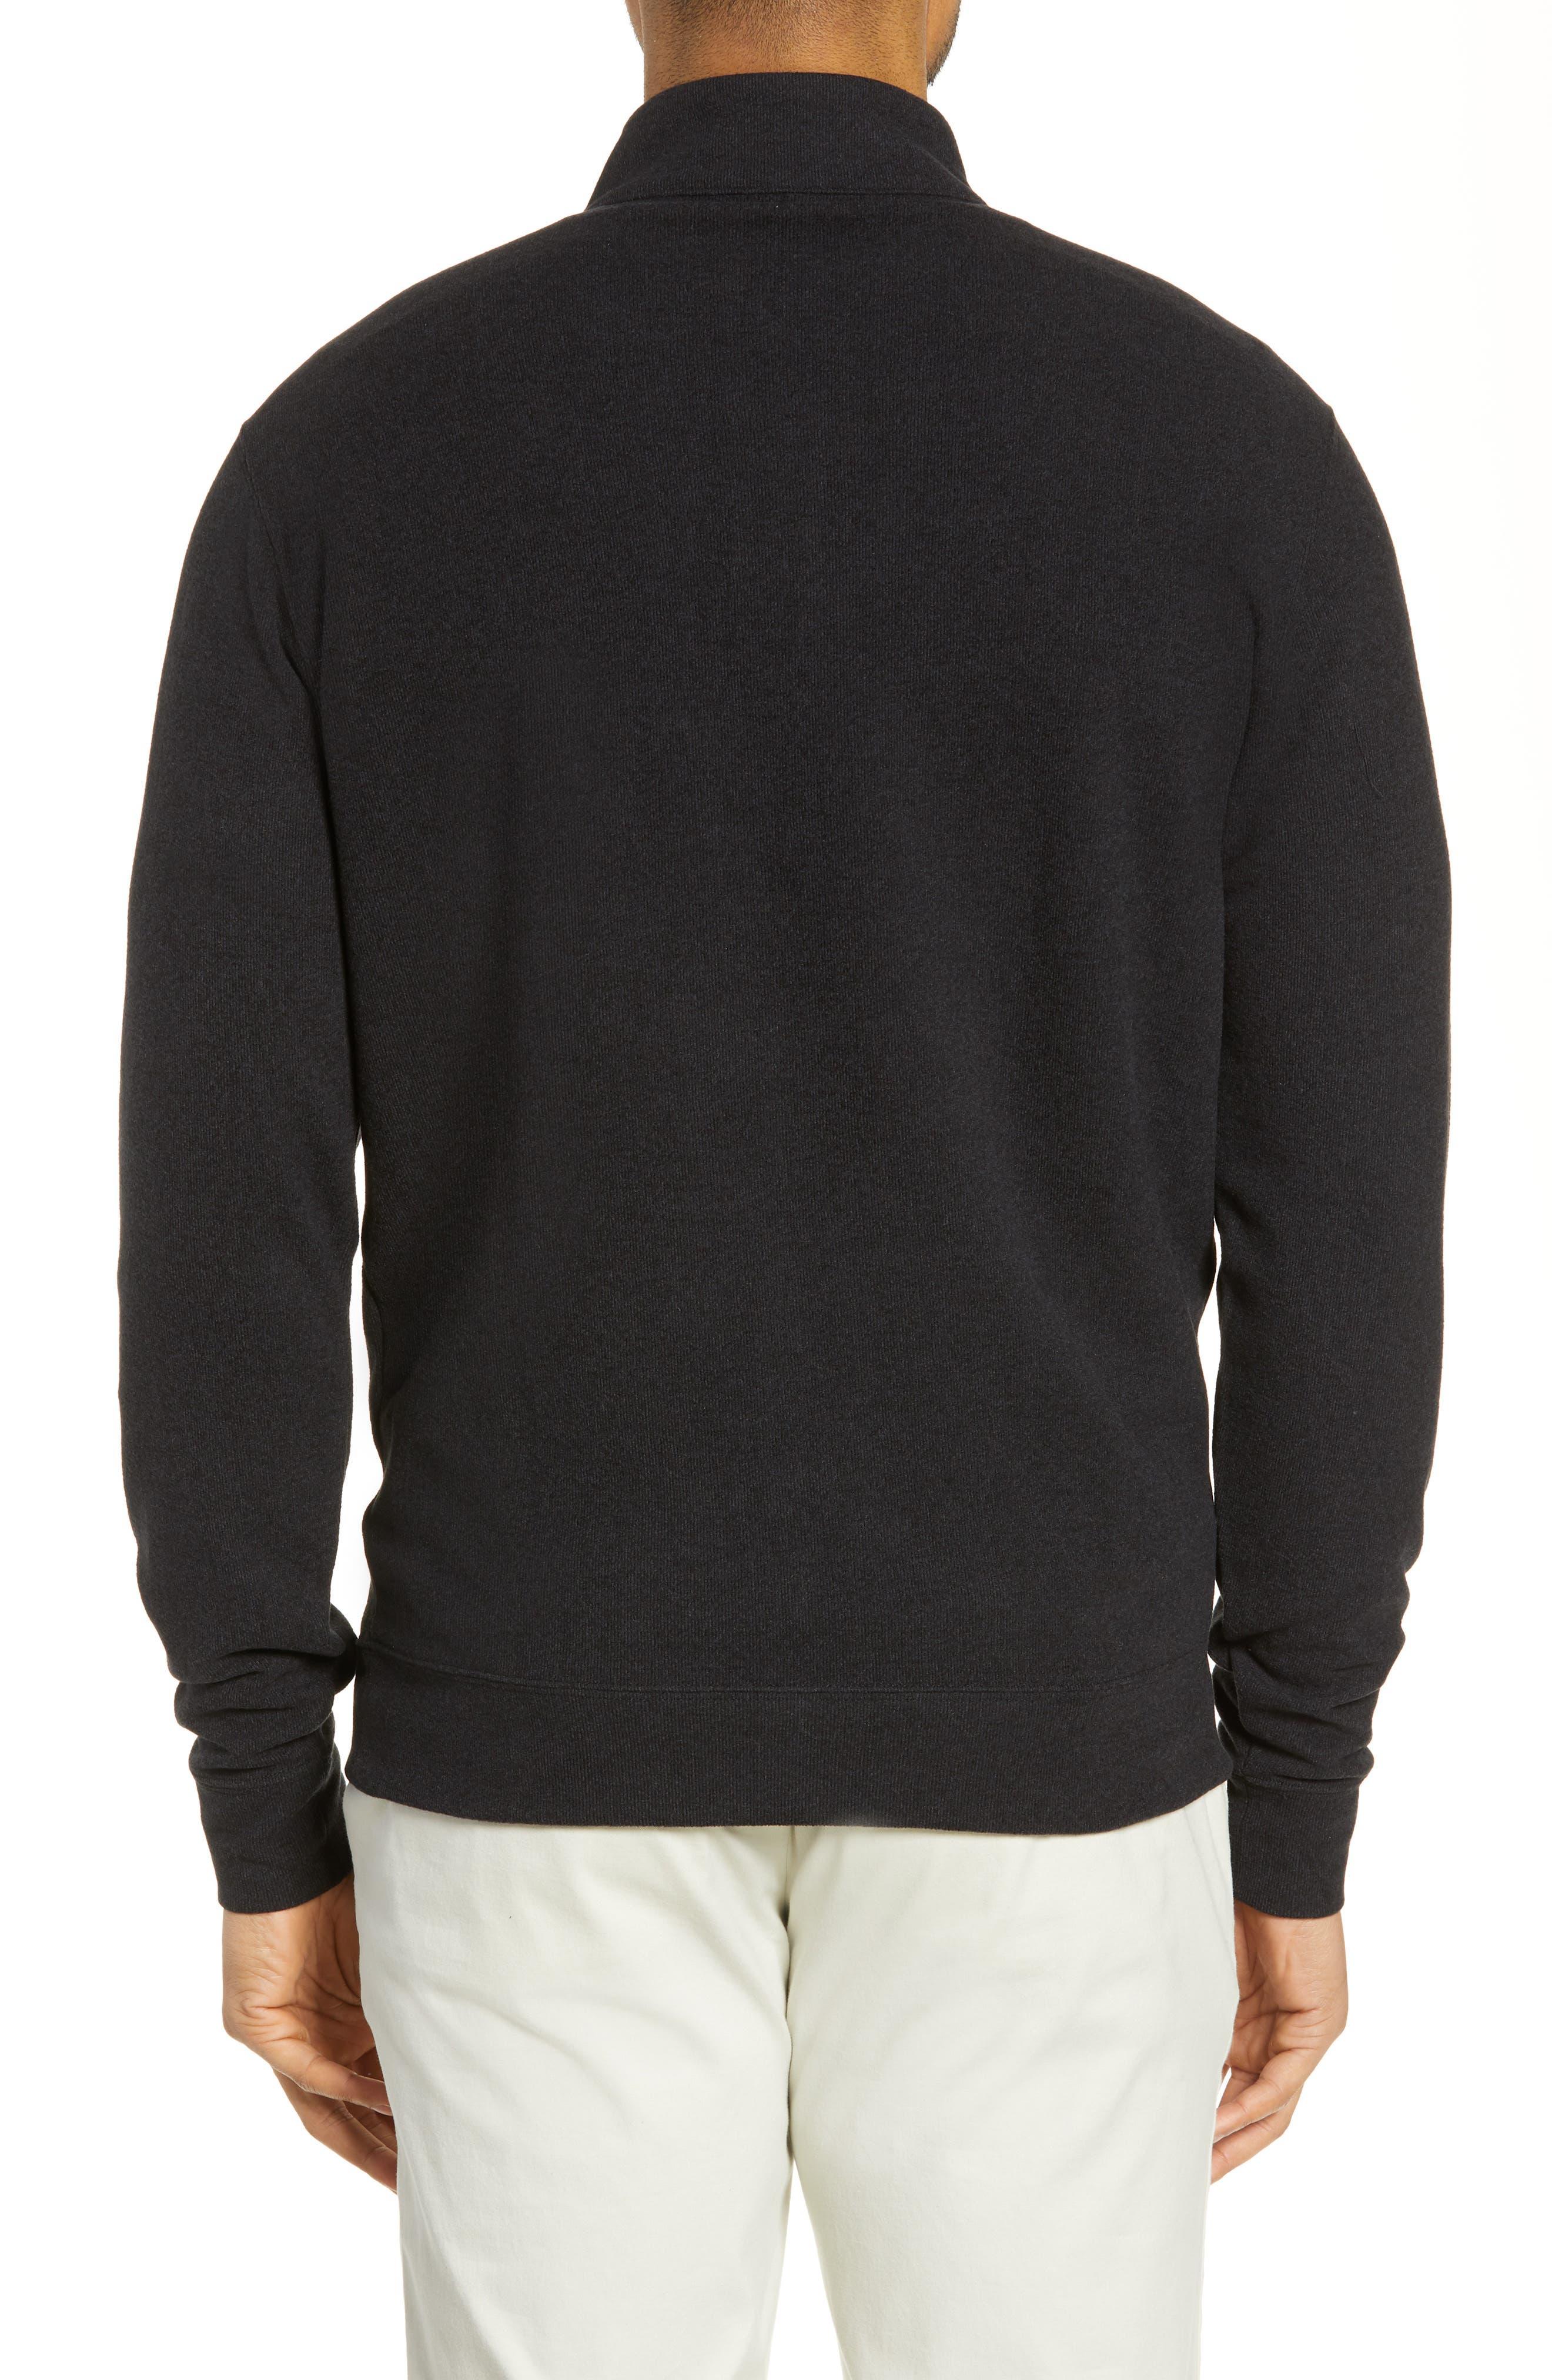 PETER MILLAR, Half Zip Pullover, Alternate thumbnail 2, color, BLACK